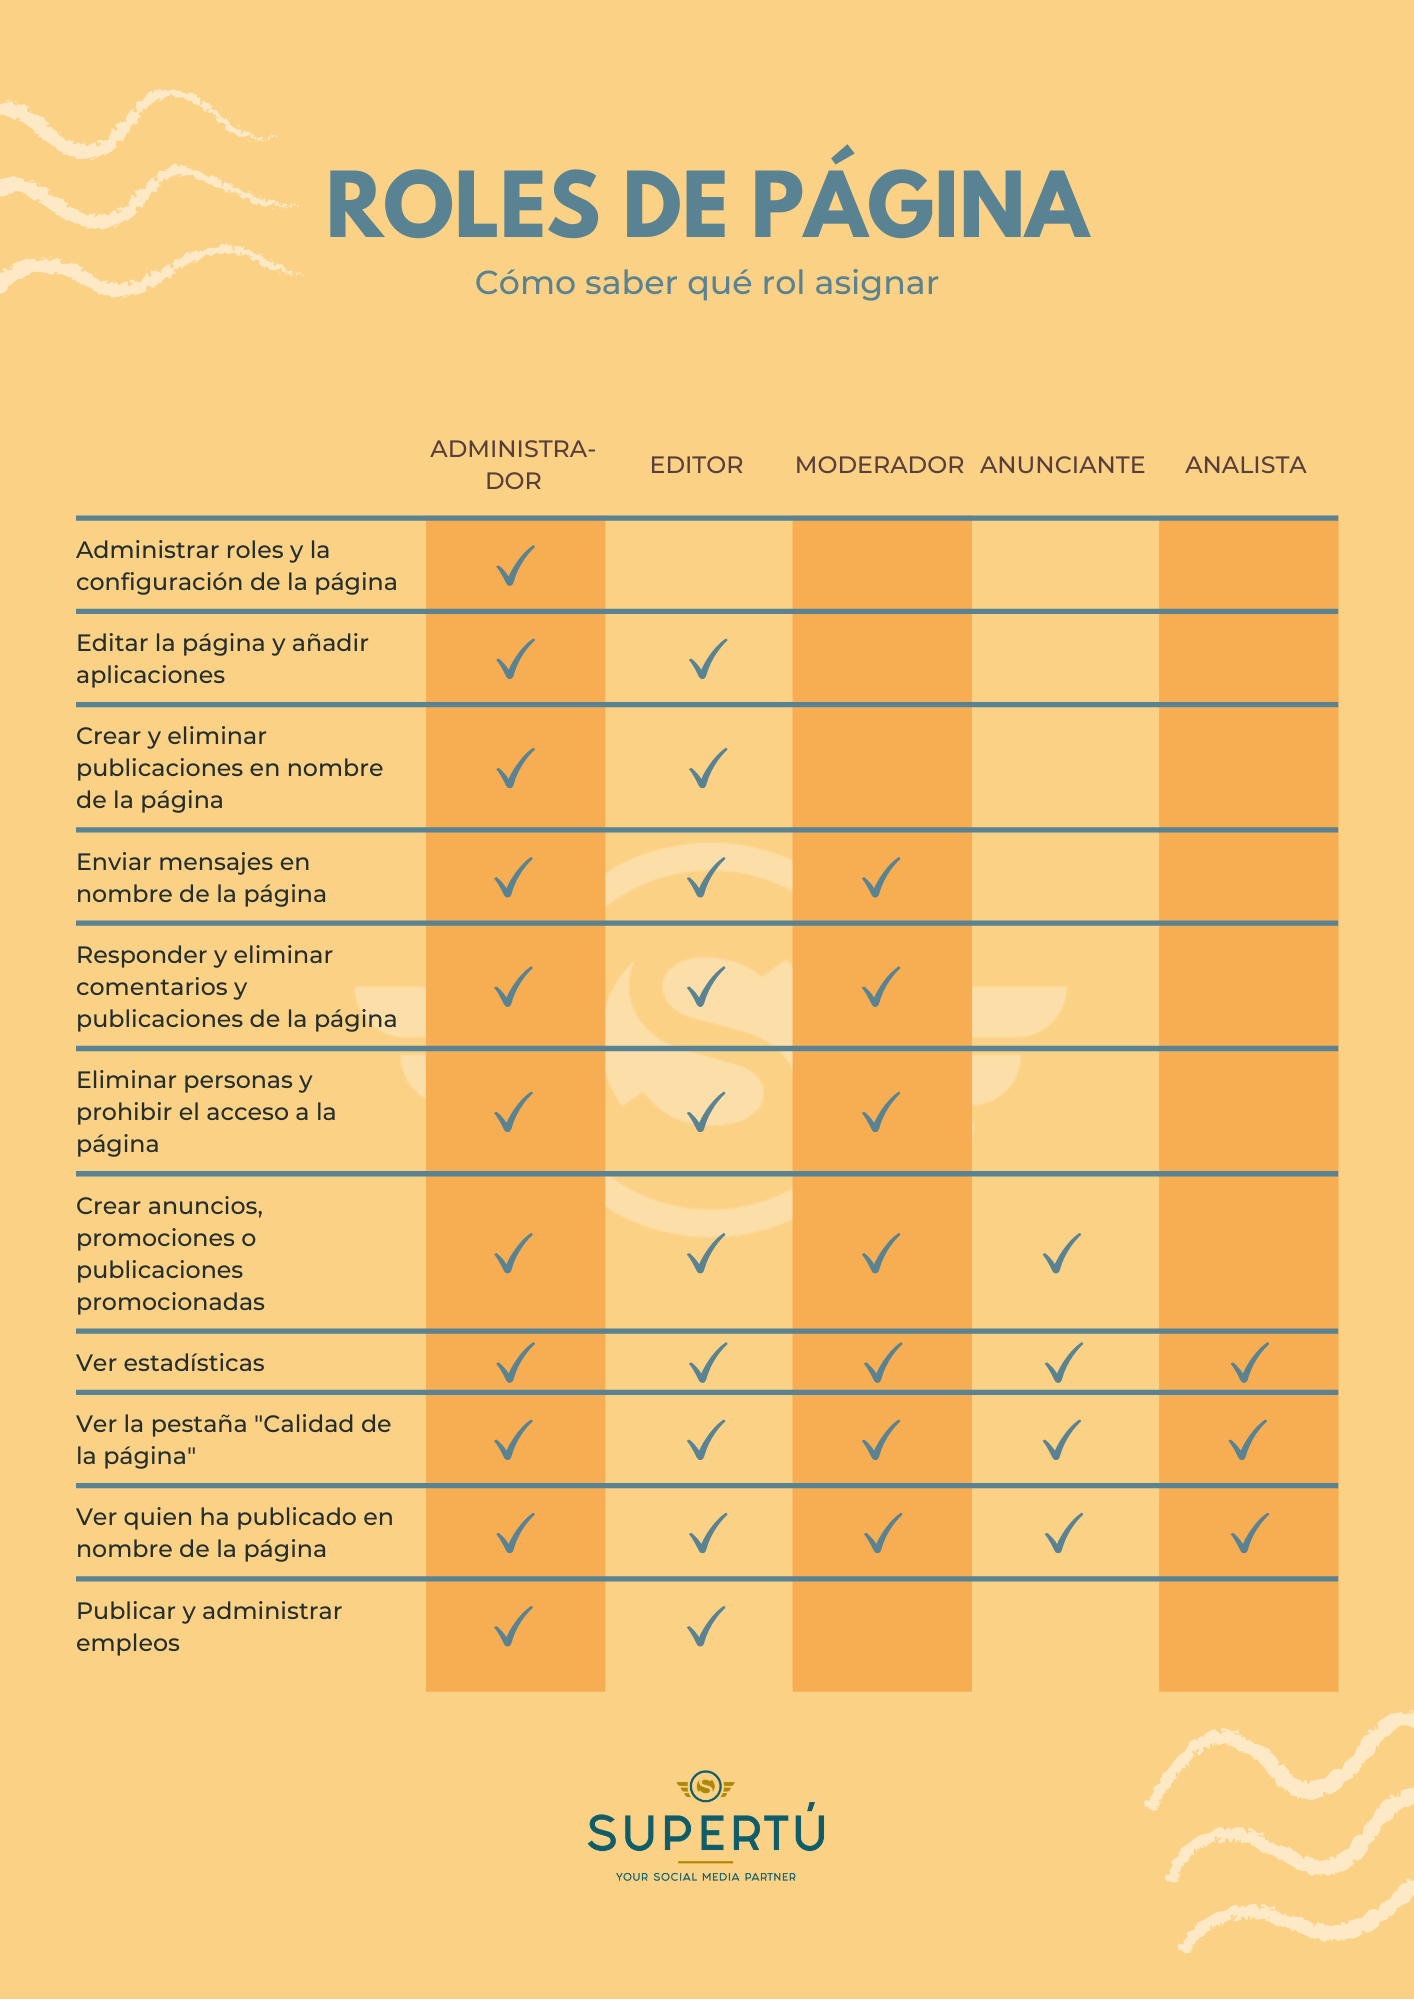 Diferentes tipos de roles de pagina